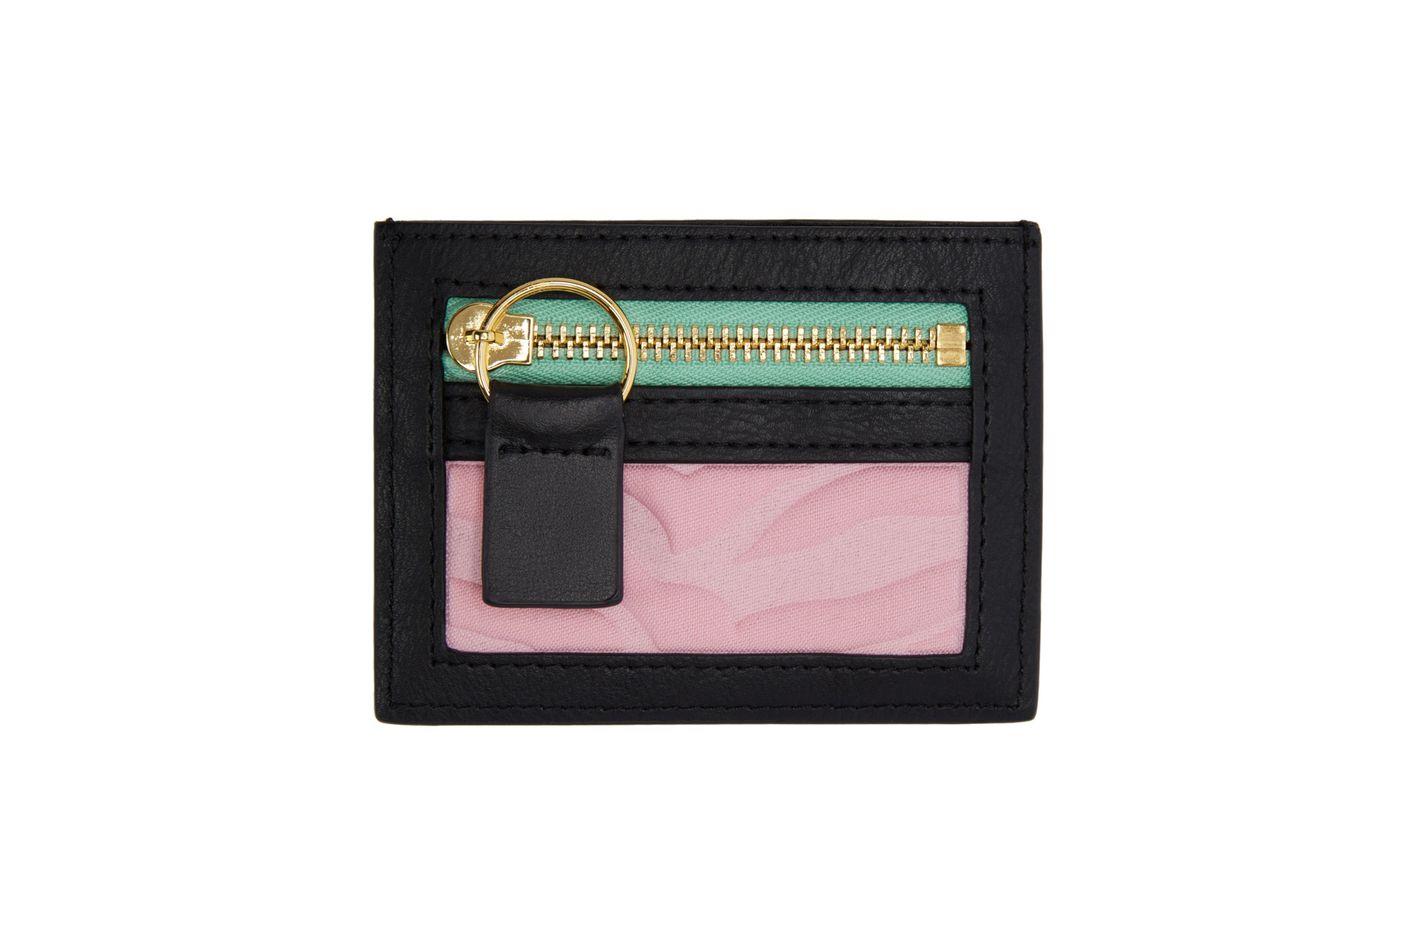 Kenzo Multicolored Kombo Card Holder